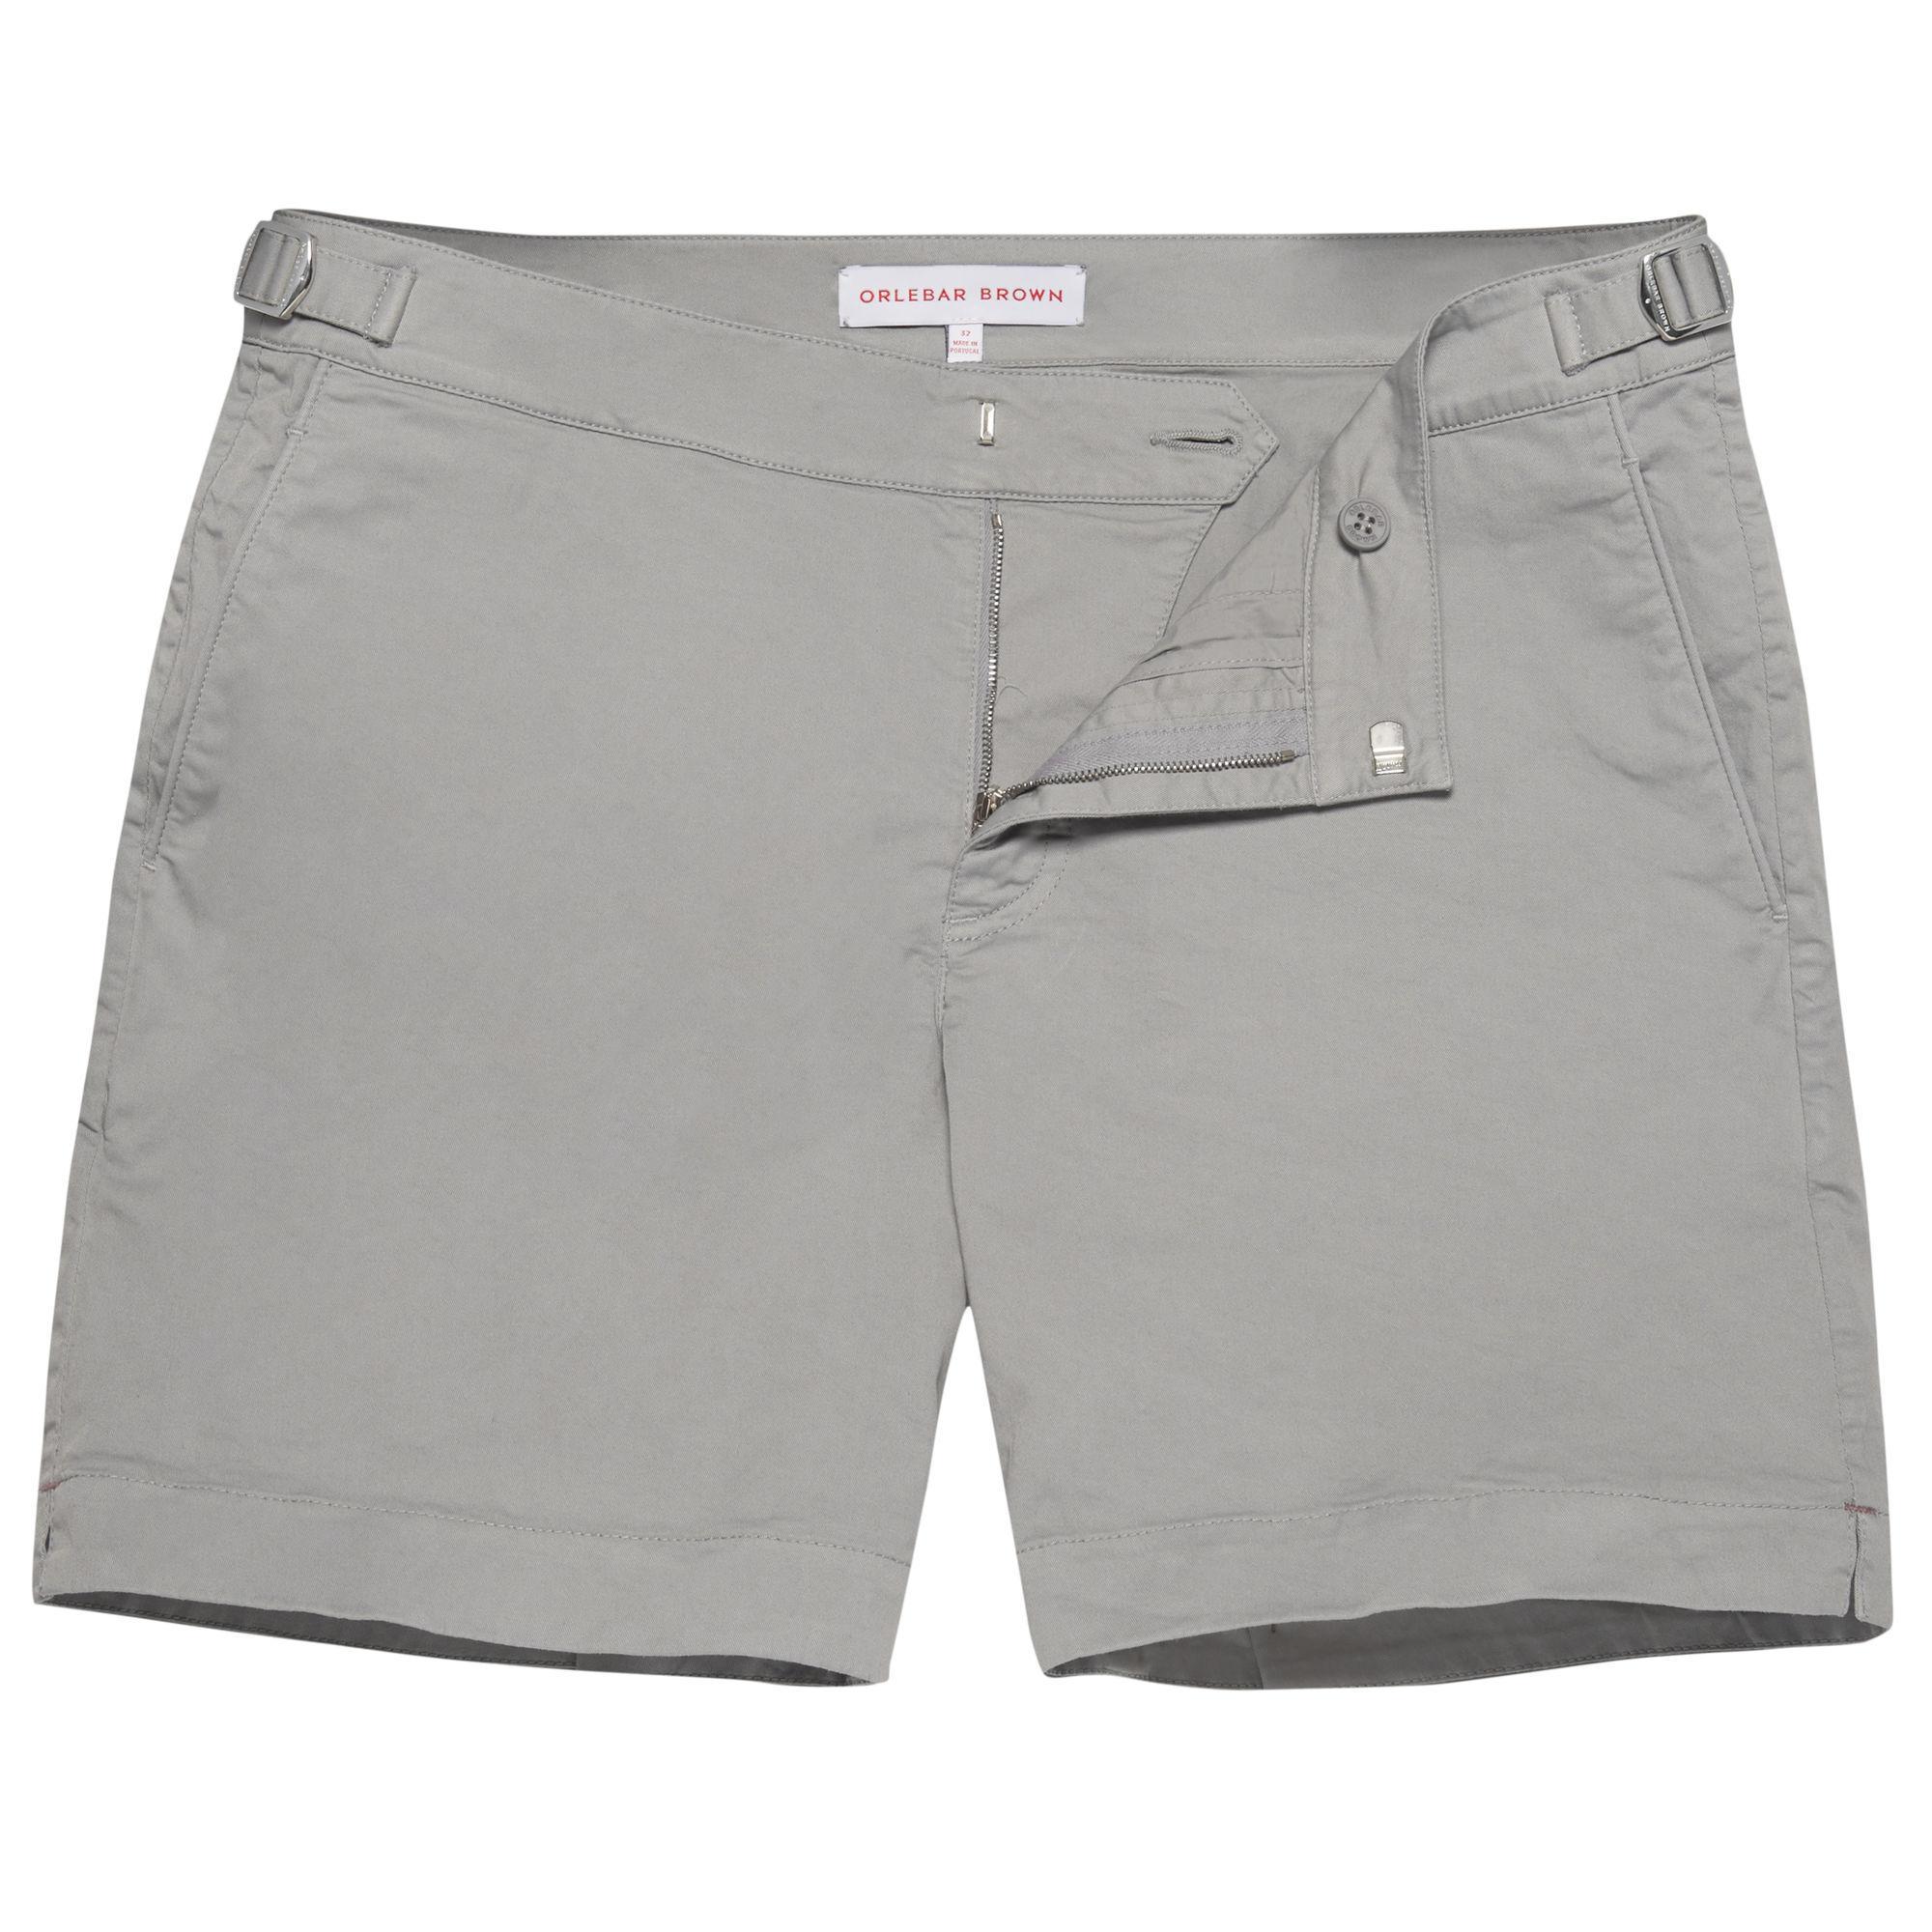 761403088bf62 Orlebar Brown - Gray Bulldog Cotton Twill Ash Mid-length Shorts for Men -  Lyst. View fullscreen